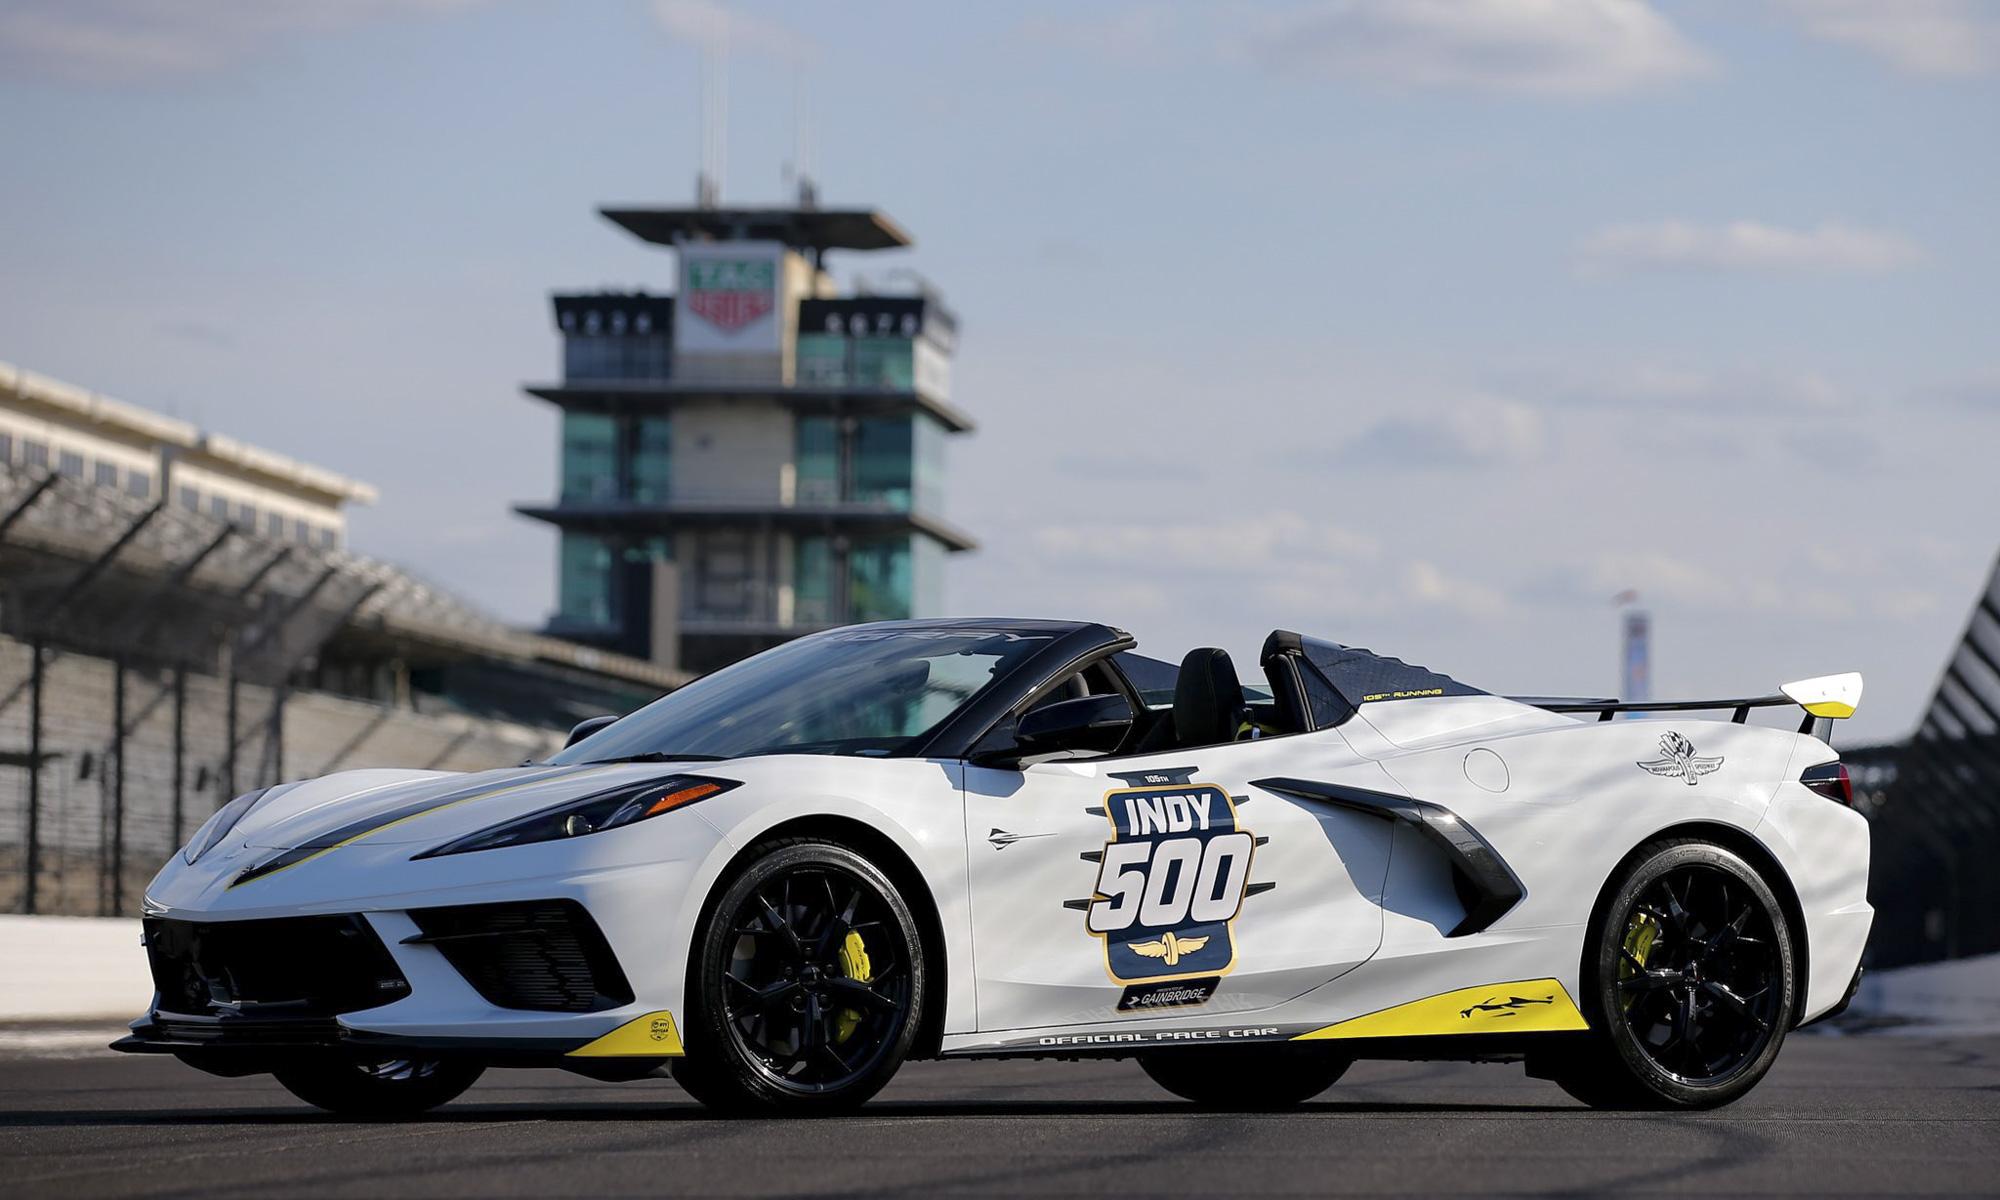 Chevrolet Corvette Convertible to Pace 2021 Indianapolis 500nbsp